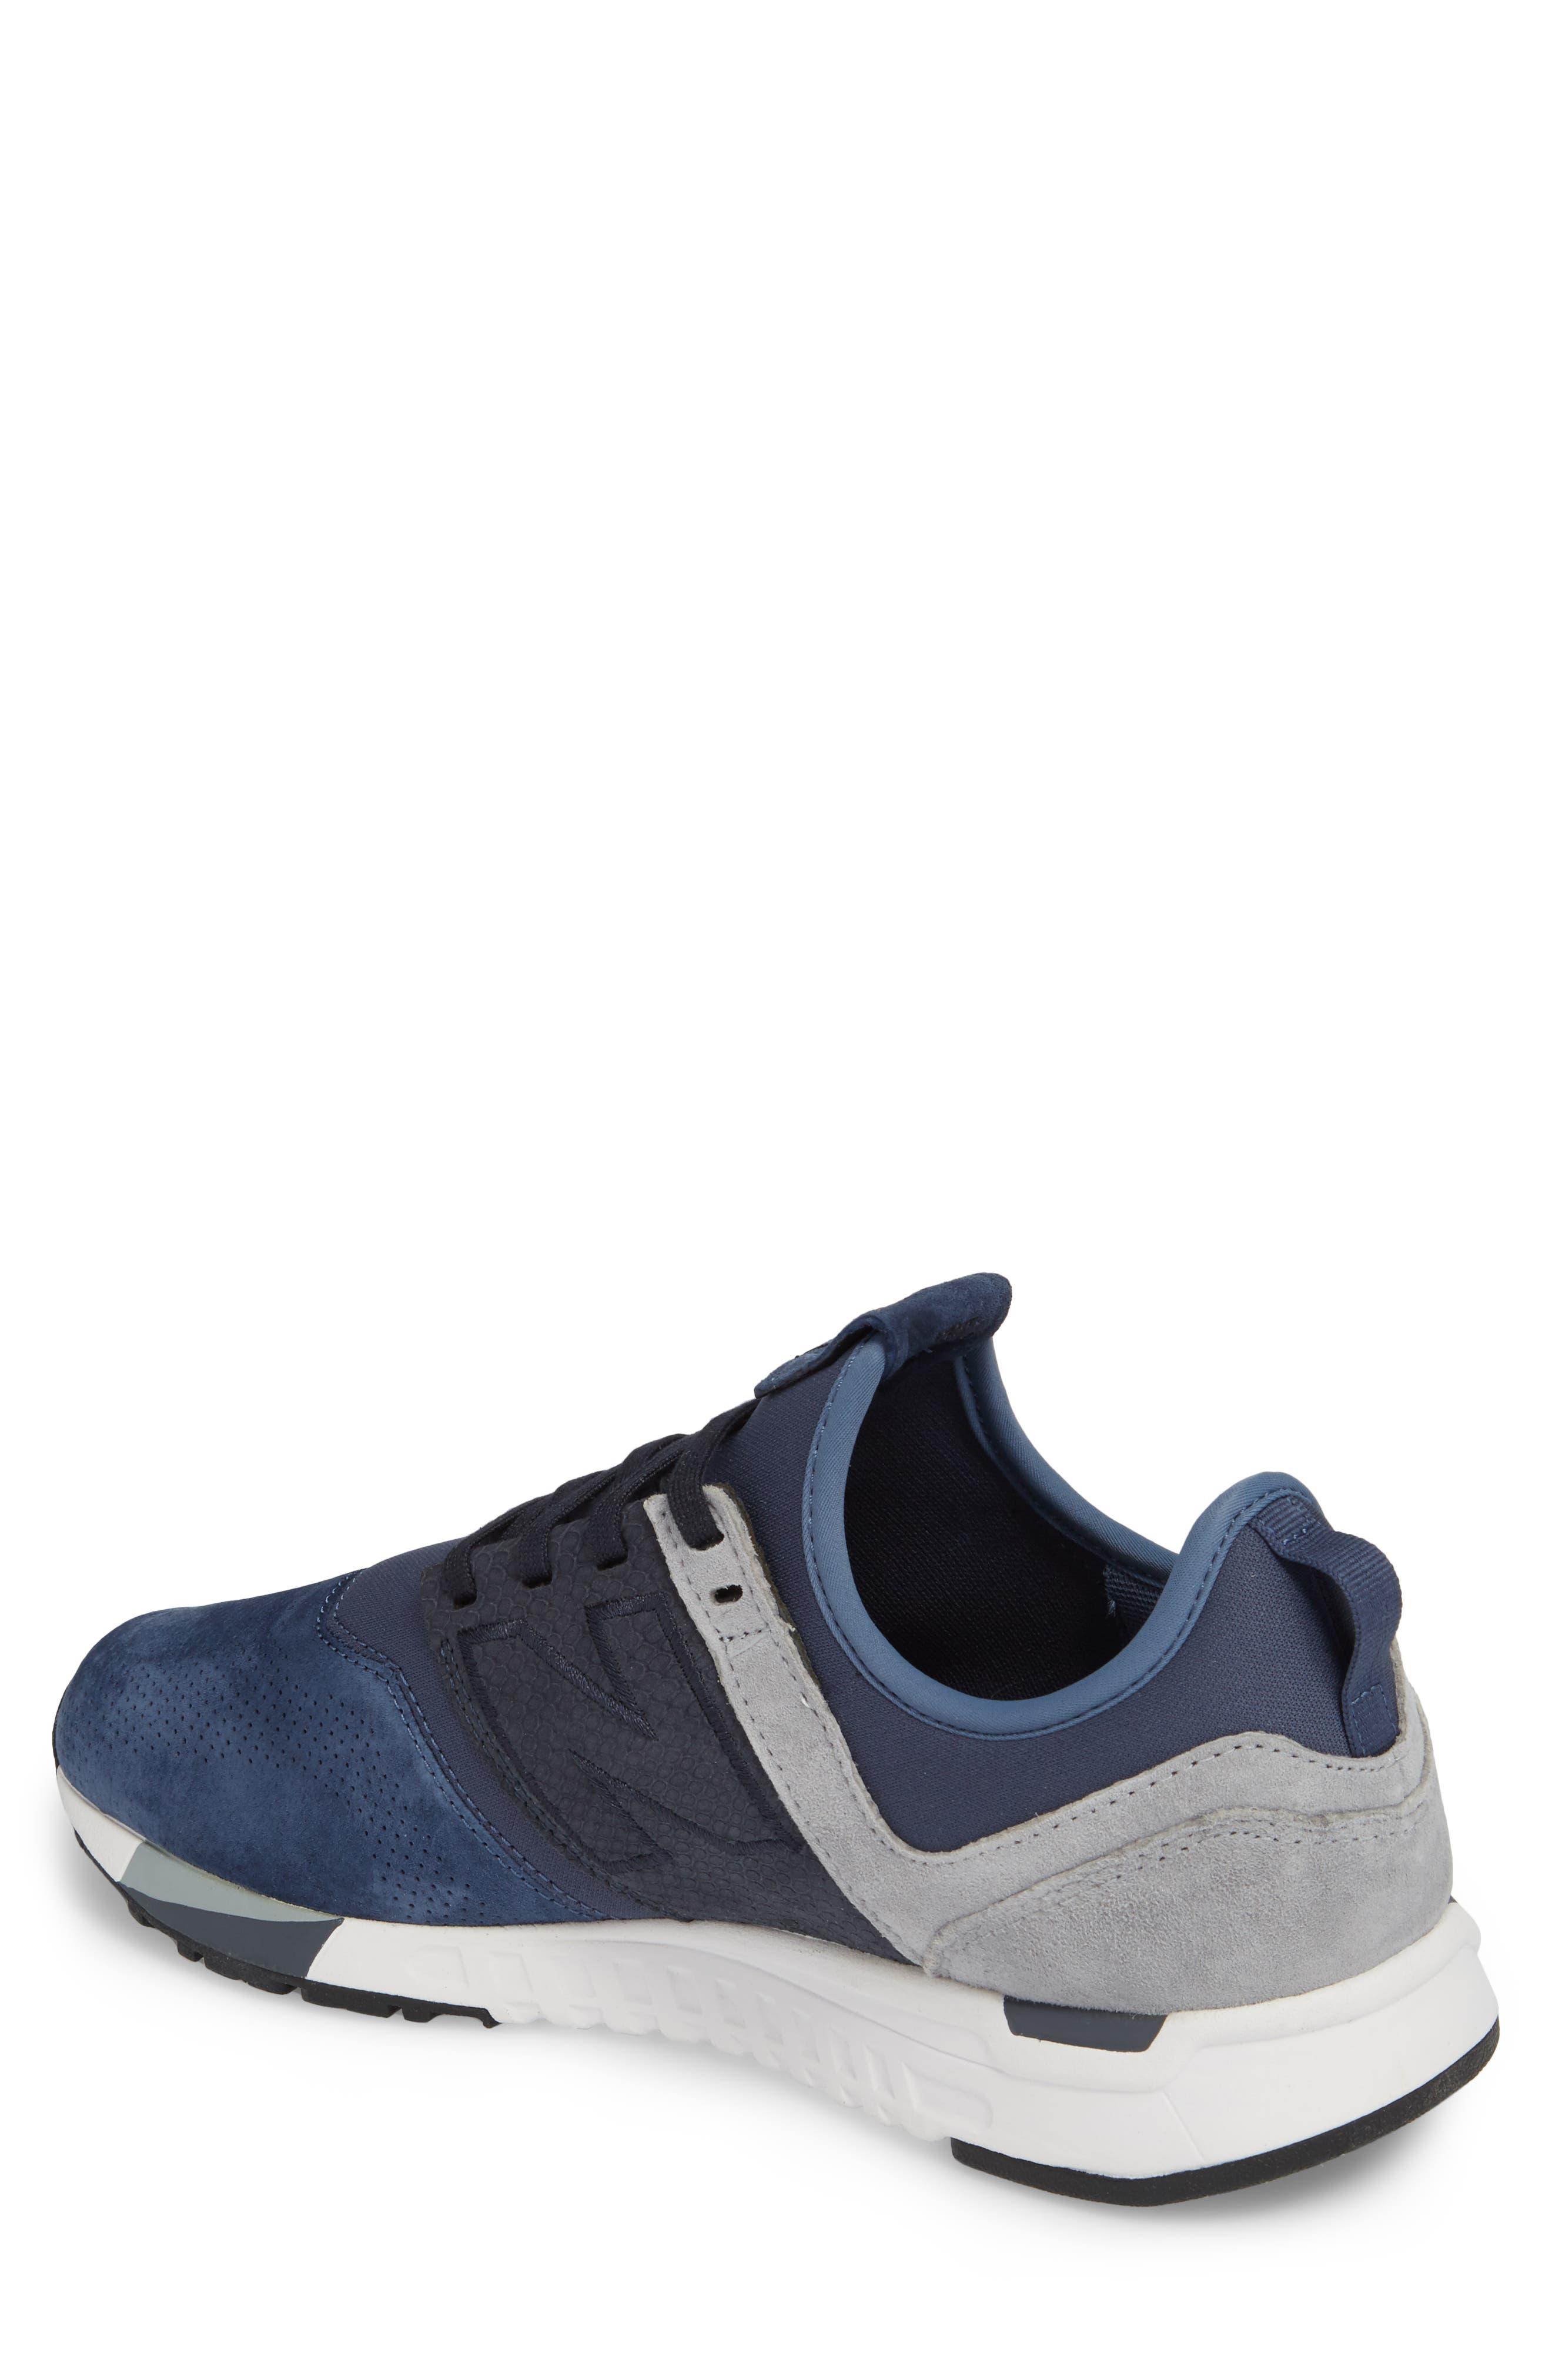 247 Luxe Sneaker,                             Alternate thumbnail 2, color,                             Blue